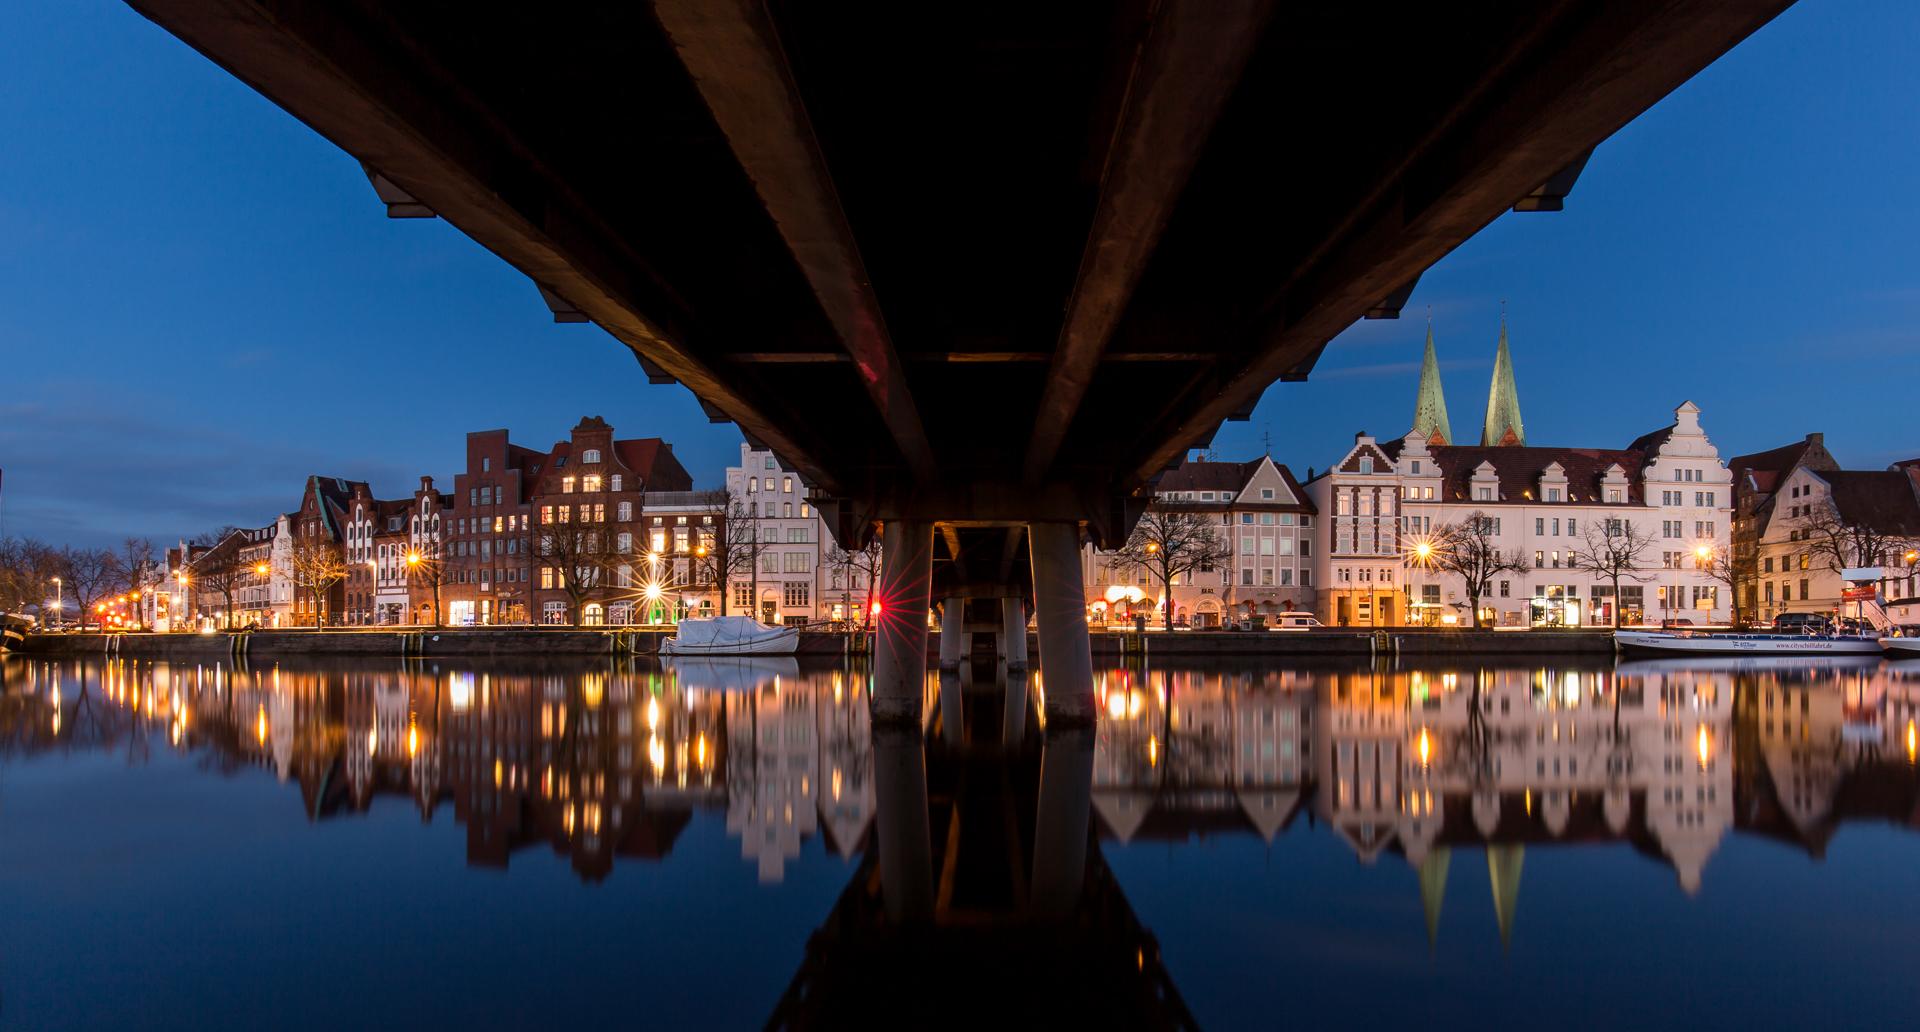 Under the bridge...